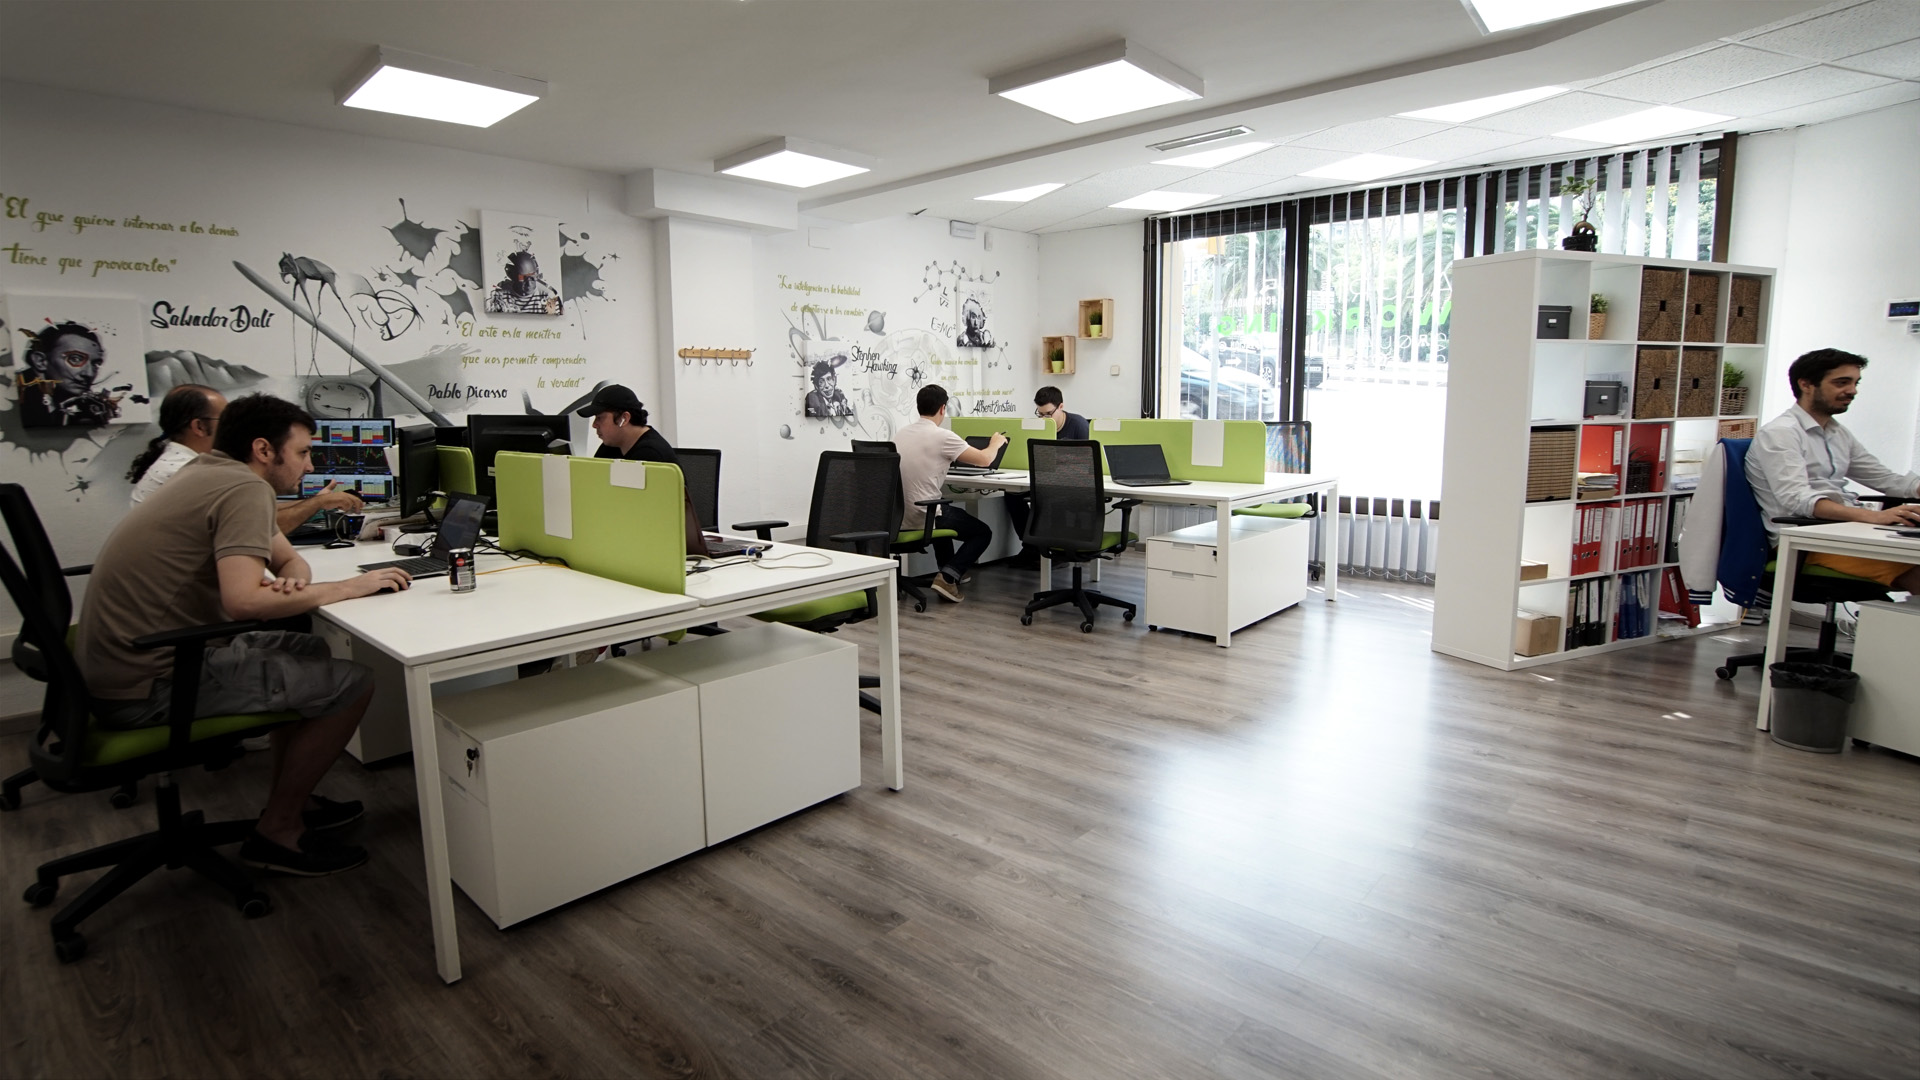 Algri Coworking Barcelona, Barcelona